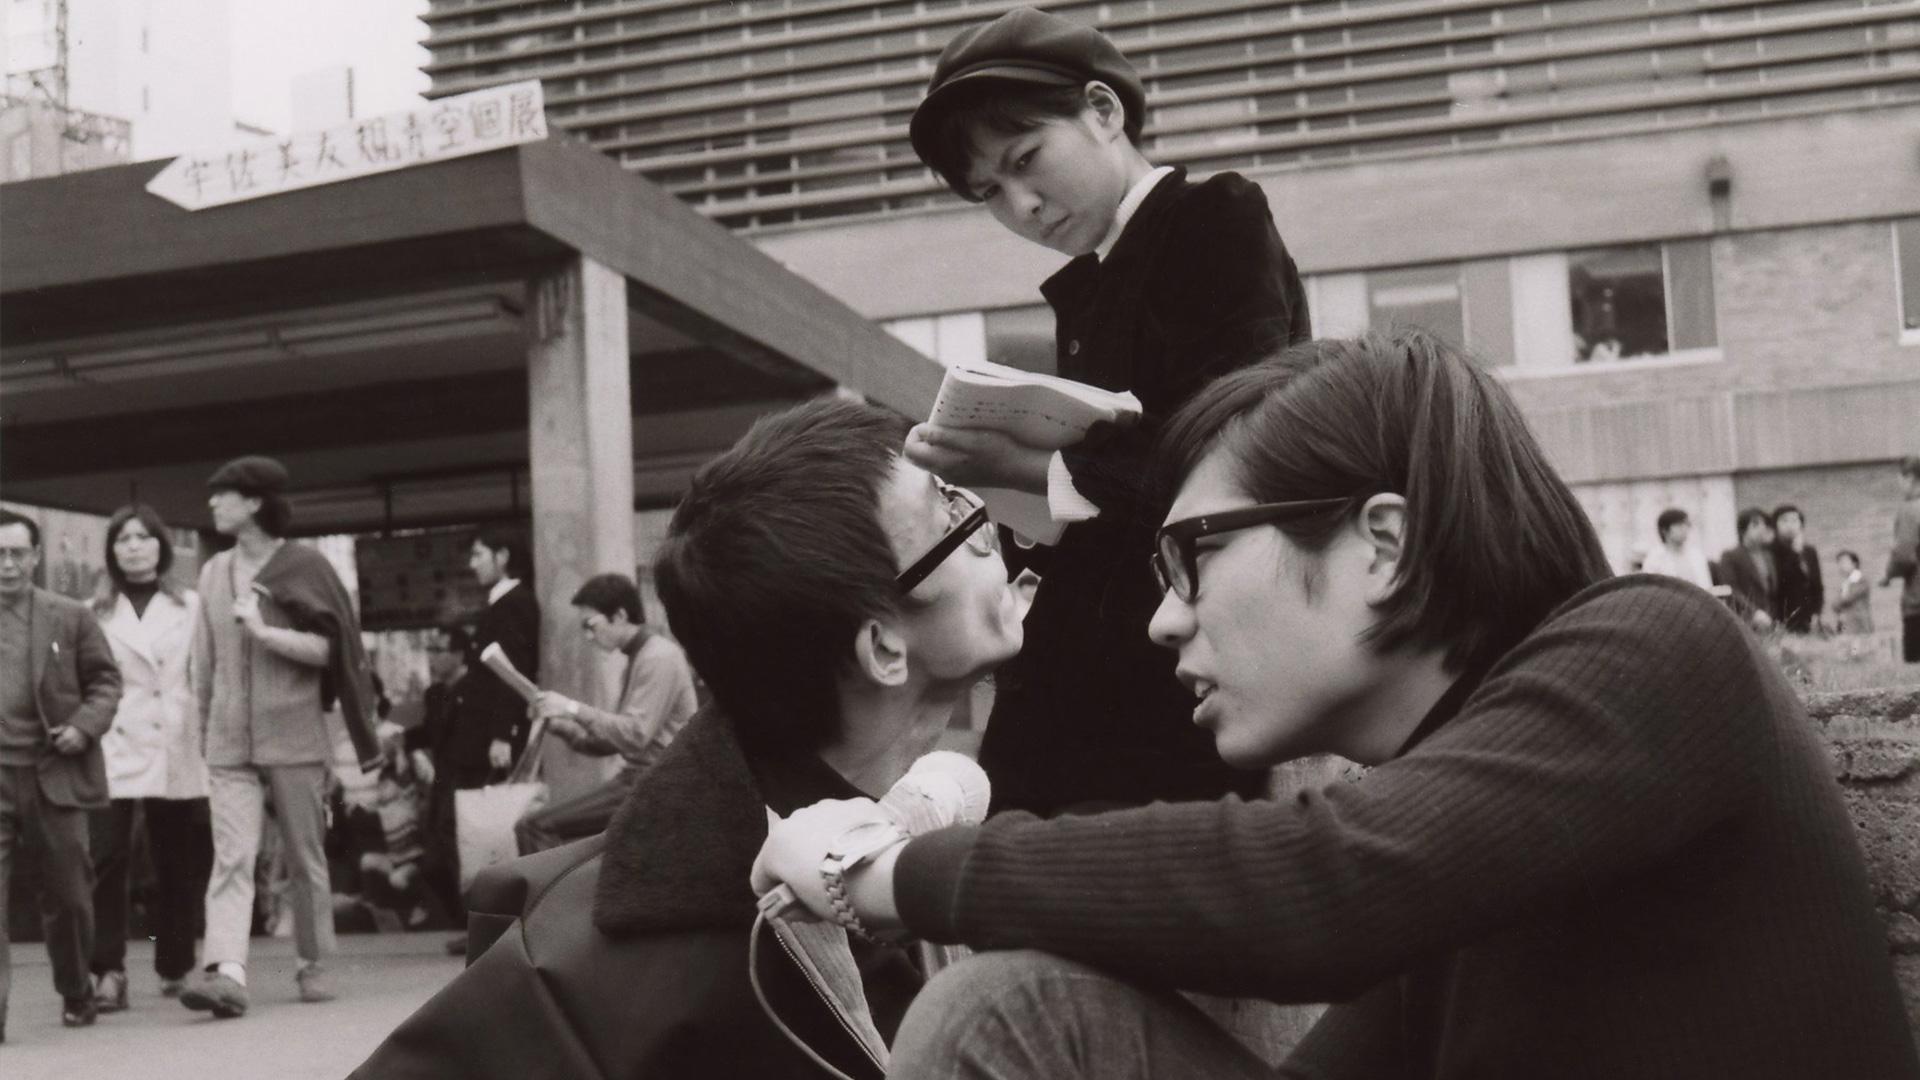 Featured image for Heroic Purgatory Podcast Covers Japan Society's Cinema as Struggle: The Films of Kazuo Hara and Sachiko Kobayashi (June 04 – July 02)